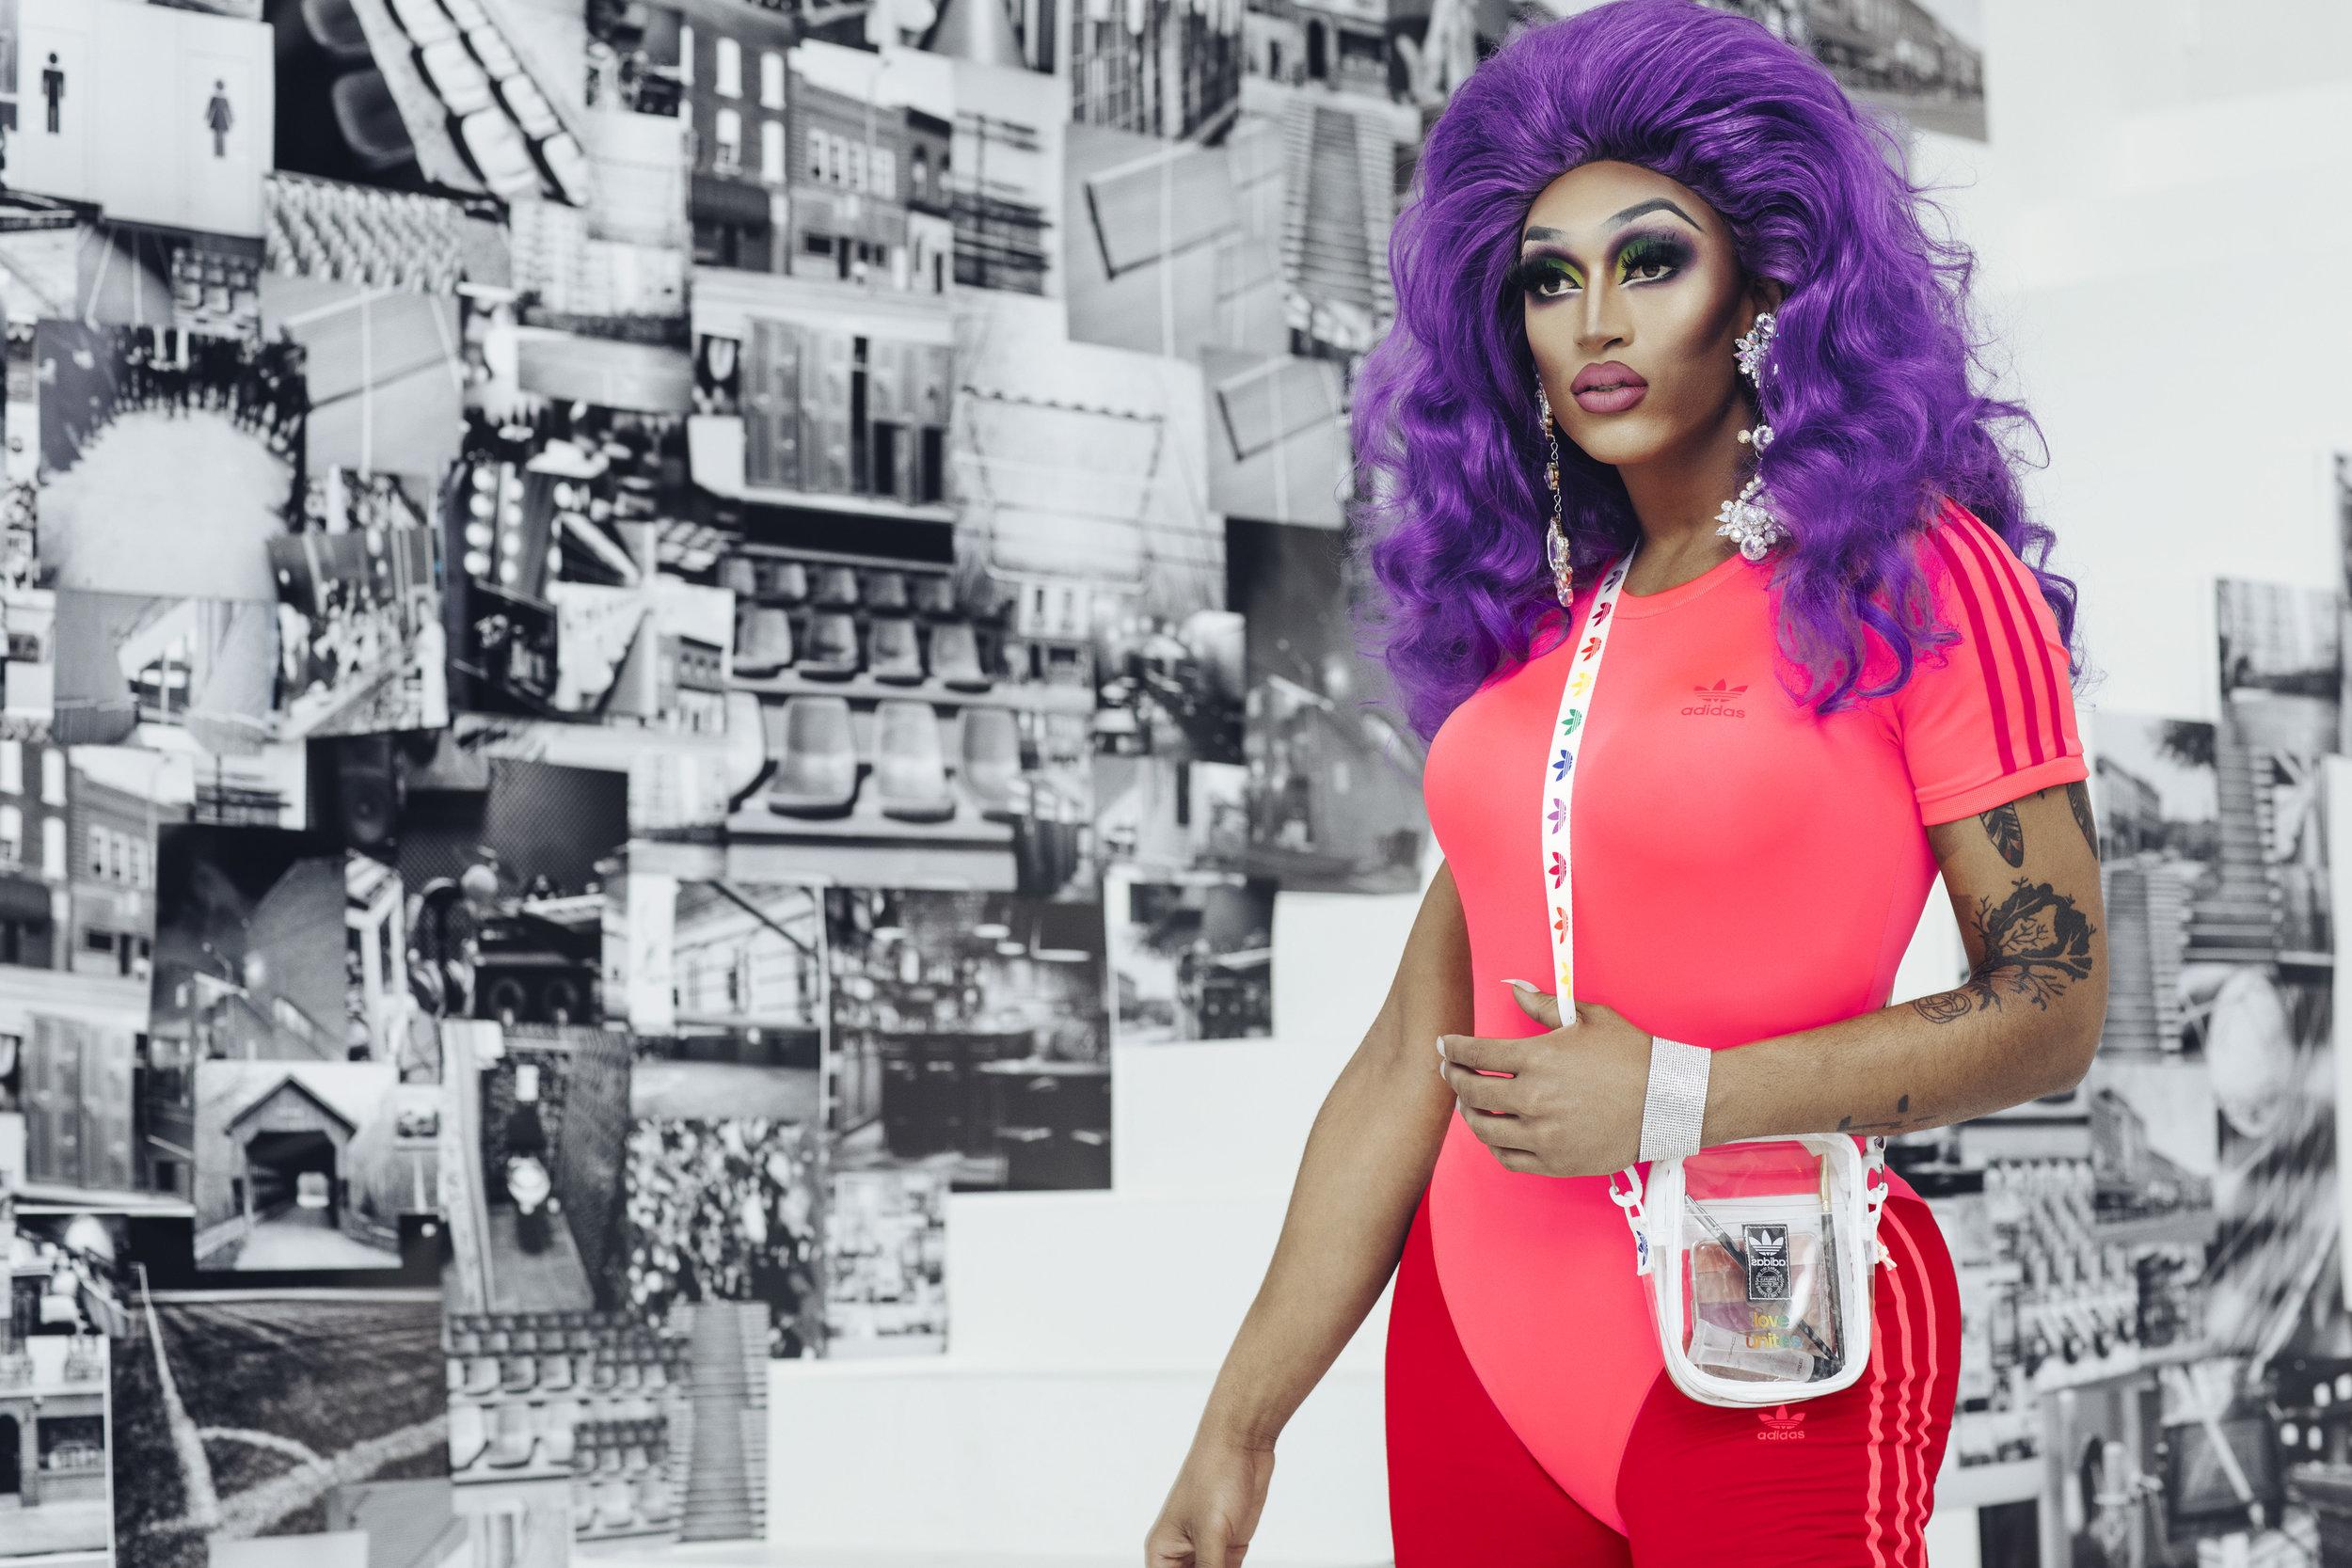 adidas_pride_love_unites_by_gia_goodrich_lesbian_artist_activist_Shot_18_Flawless_Lk_02_01634.jpg